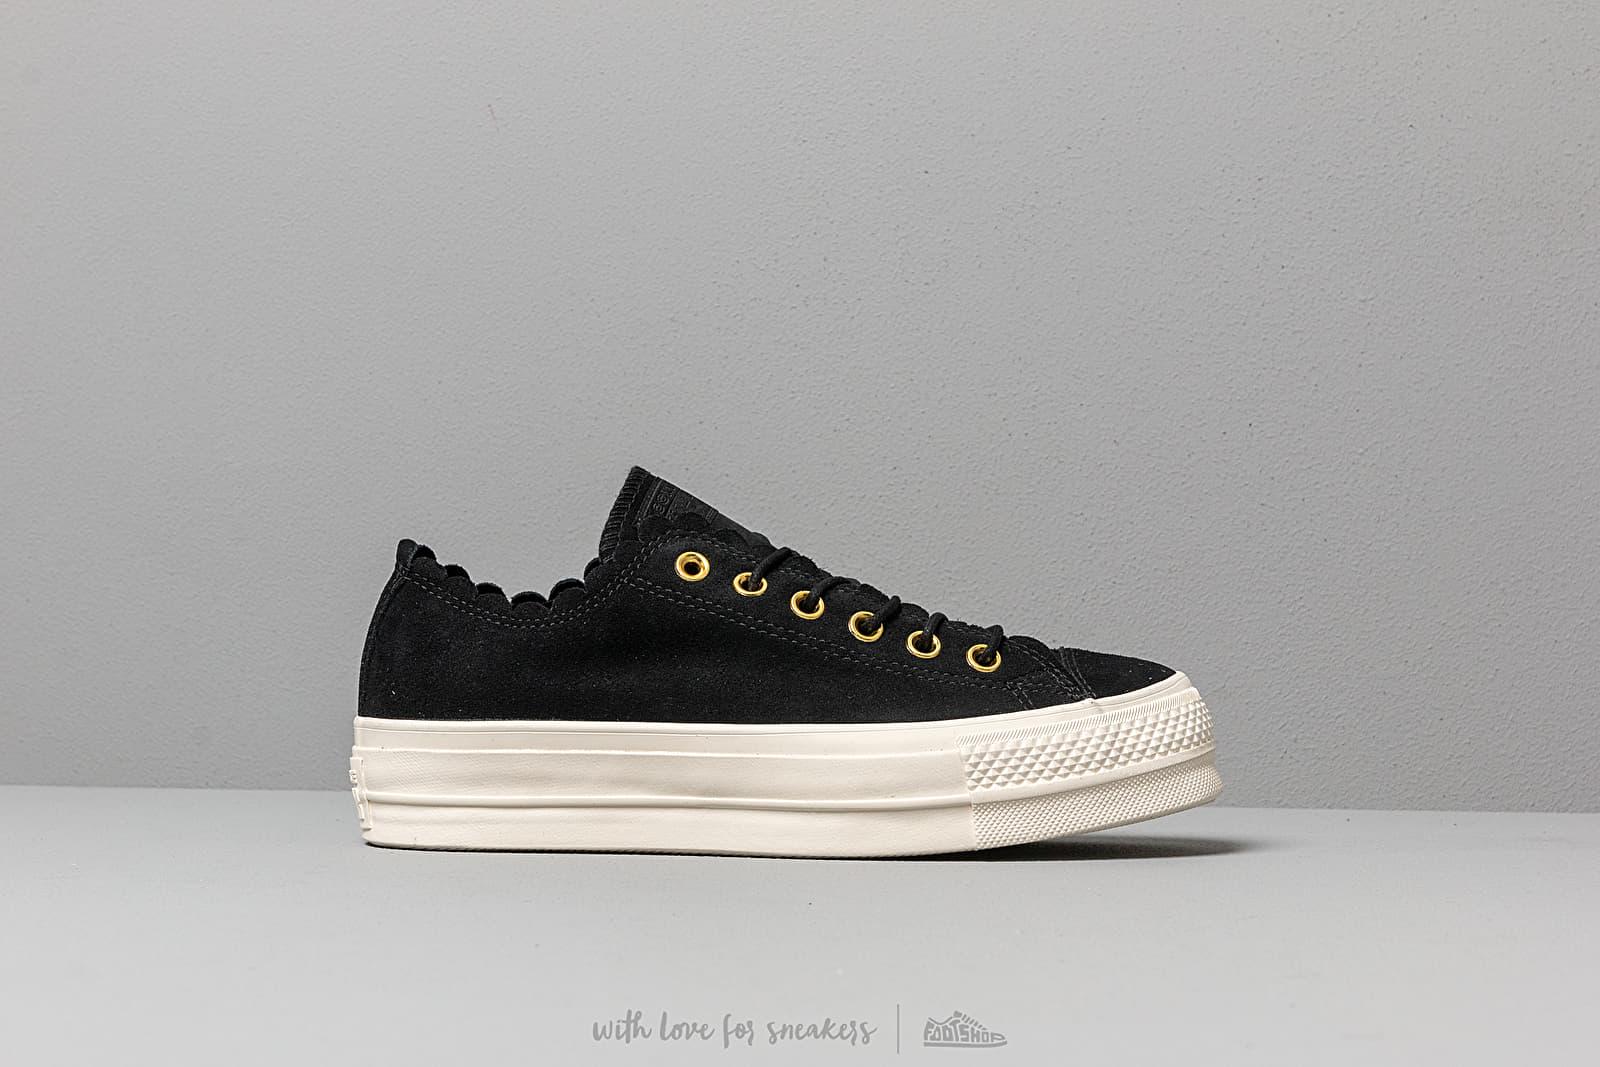 a22a5d6bda Converse Chuck Taylor AS Lift Scallop Black at a great price 92 € buy at  Footshop